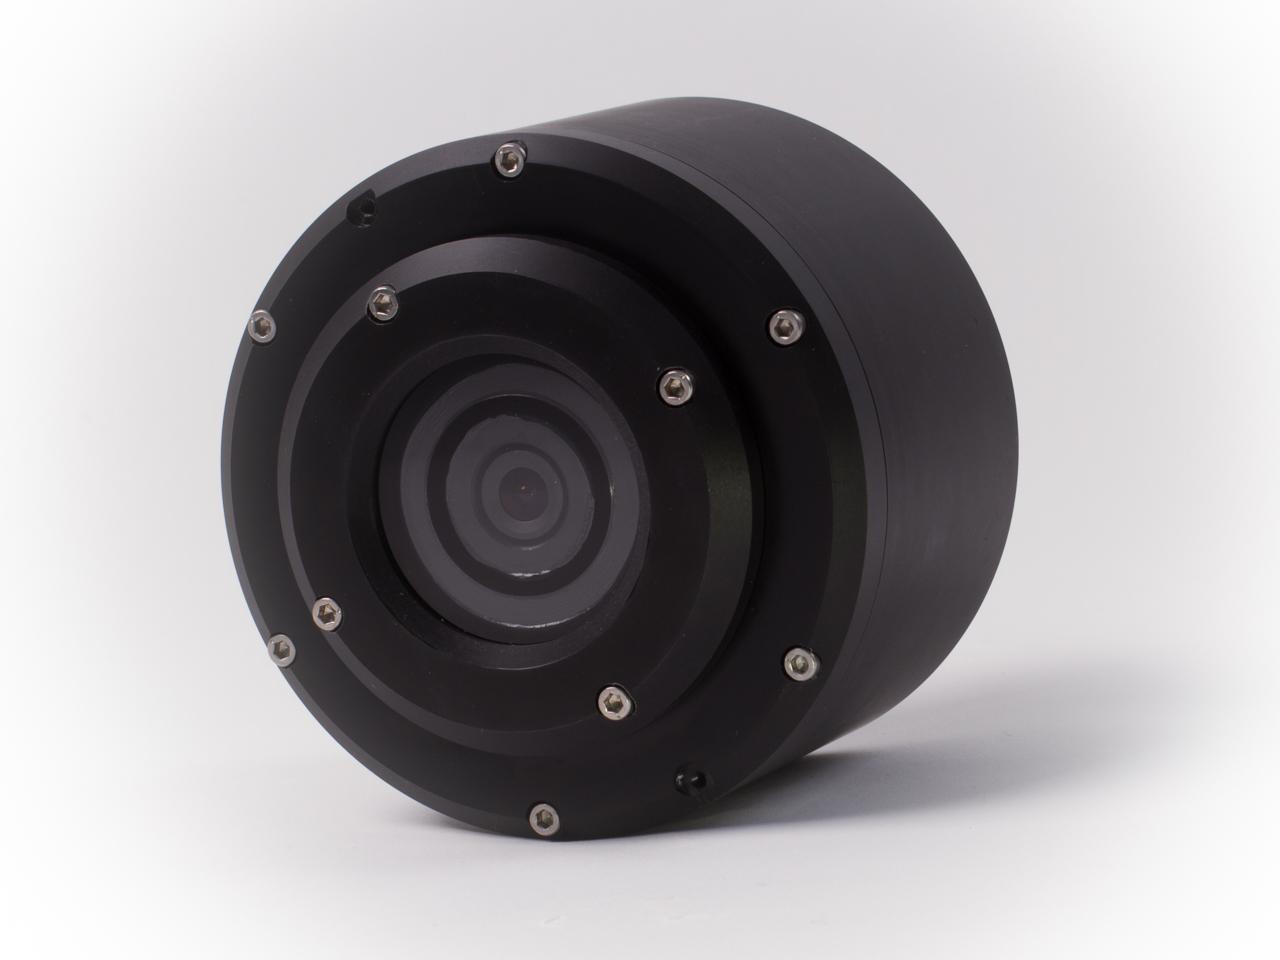 OceanCAM-IP underwater Internet Protocol low light HD camera